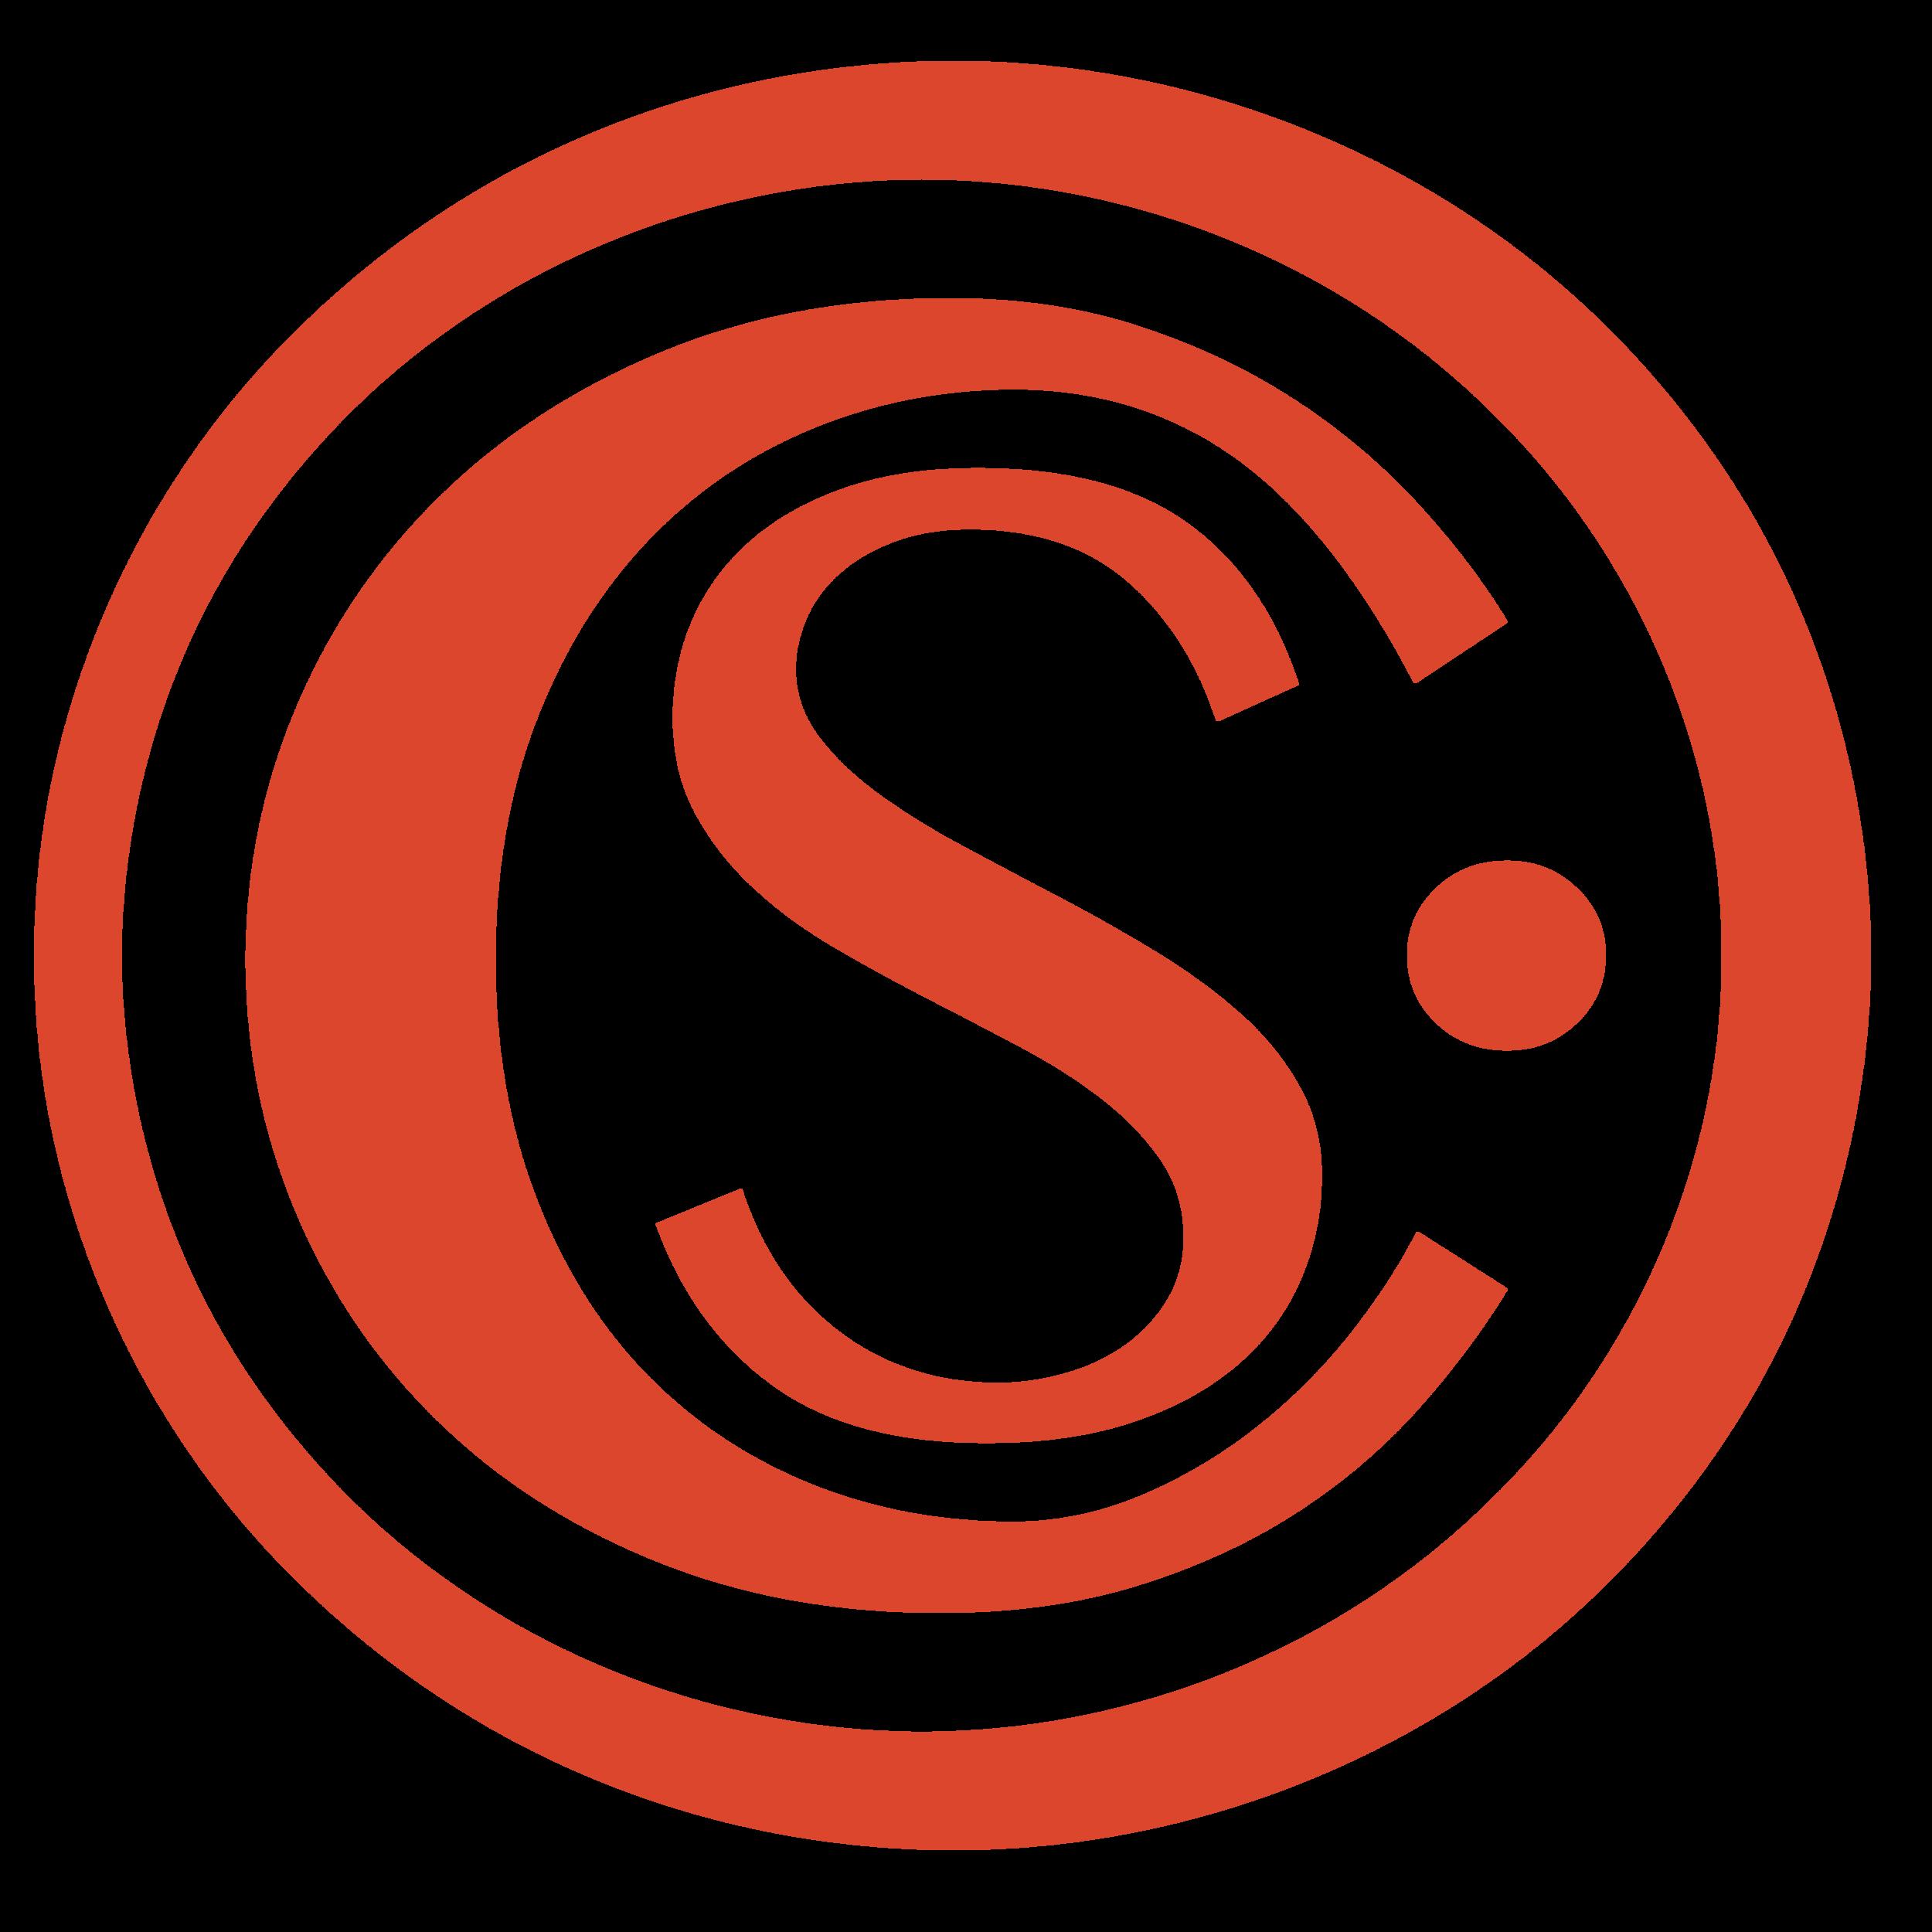 Personal branding logo design for Caleb Sweeting